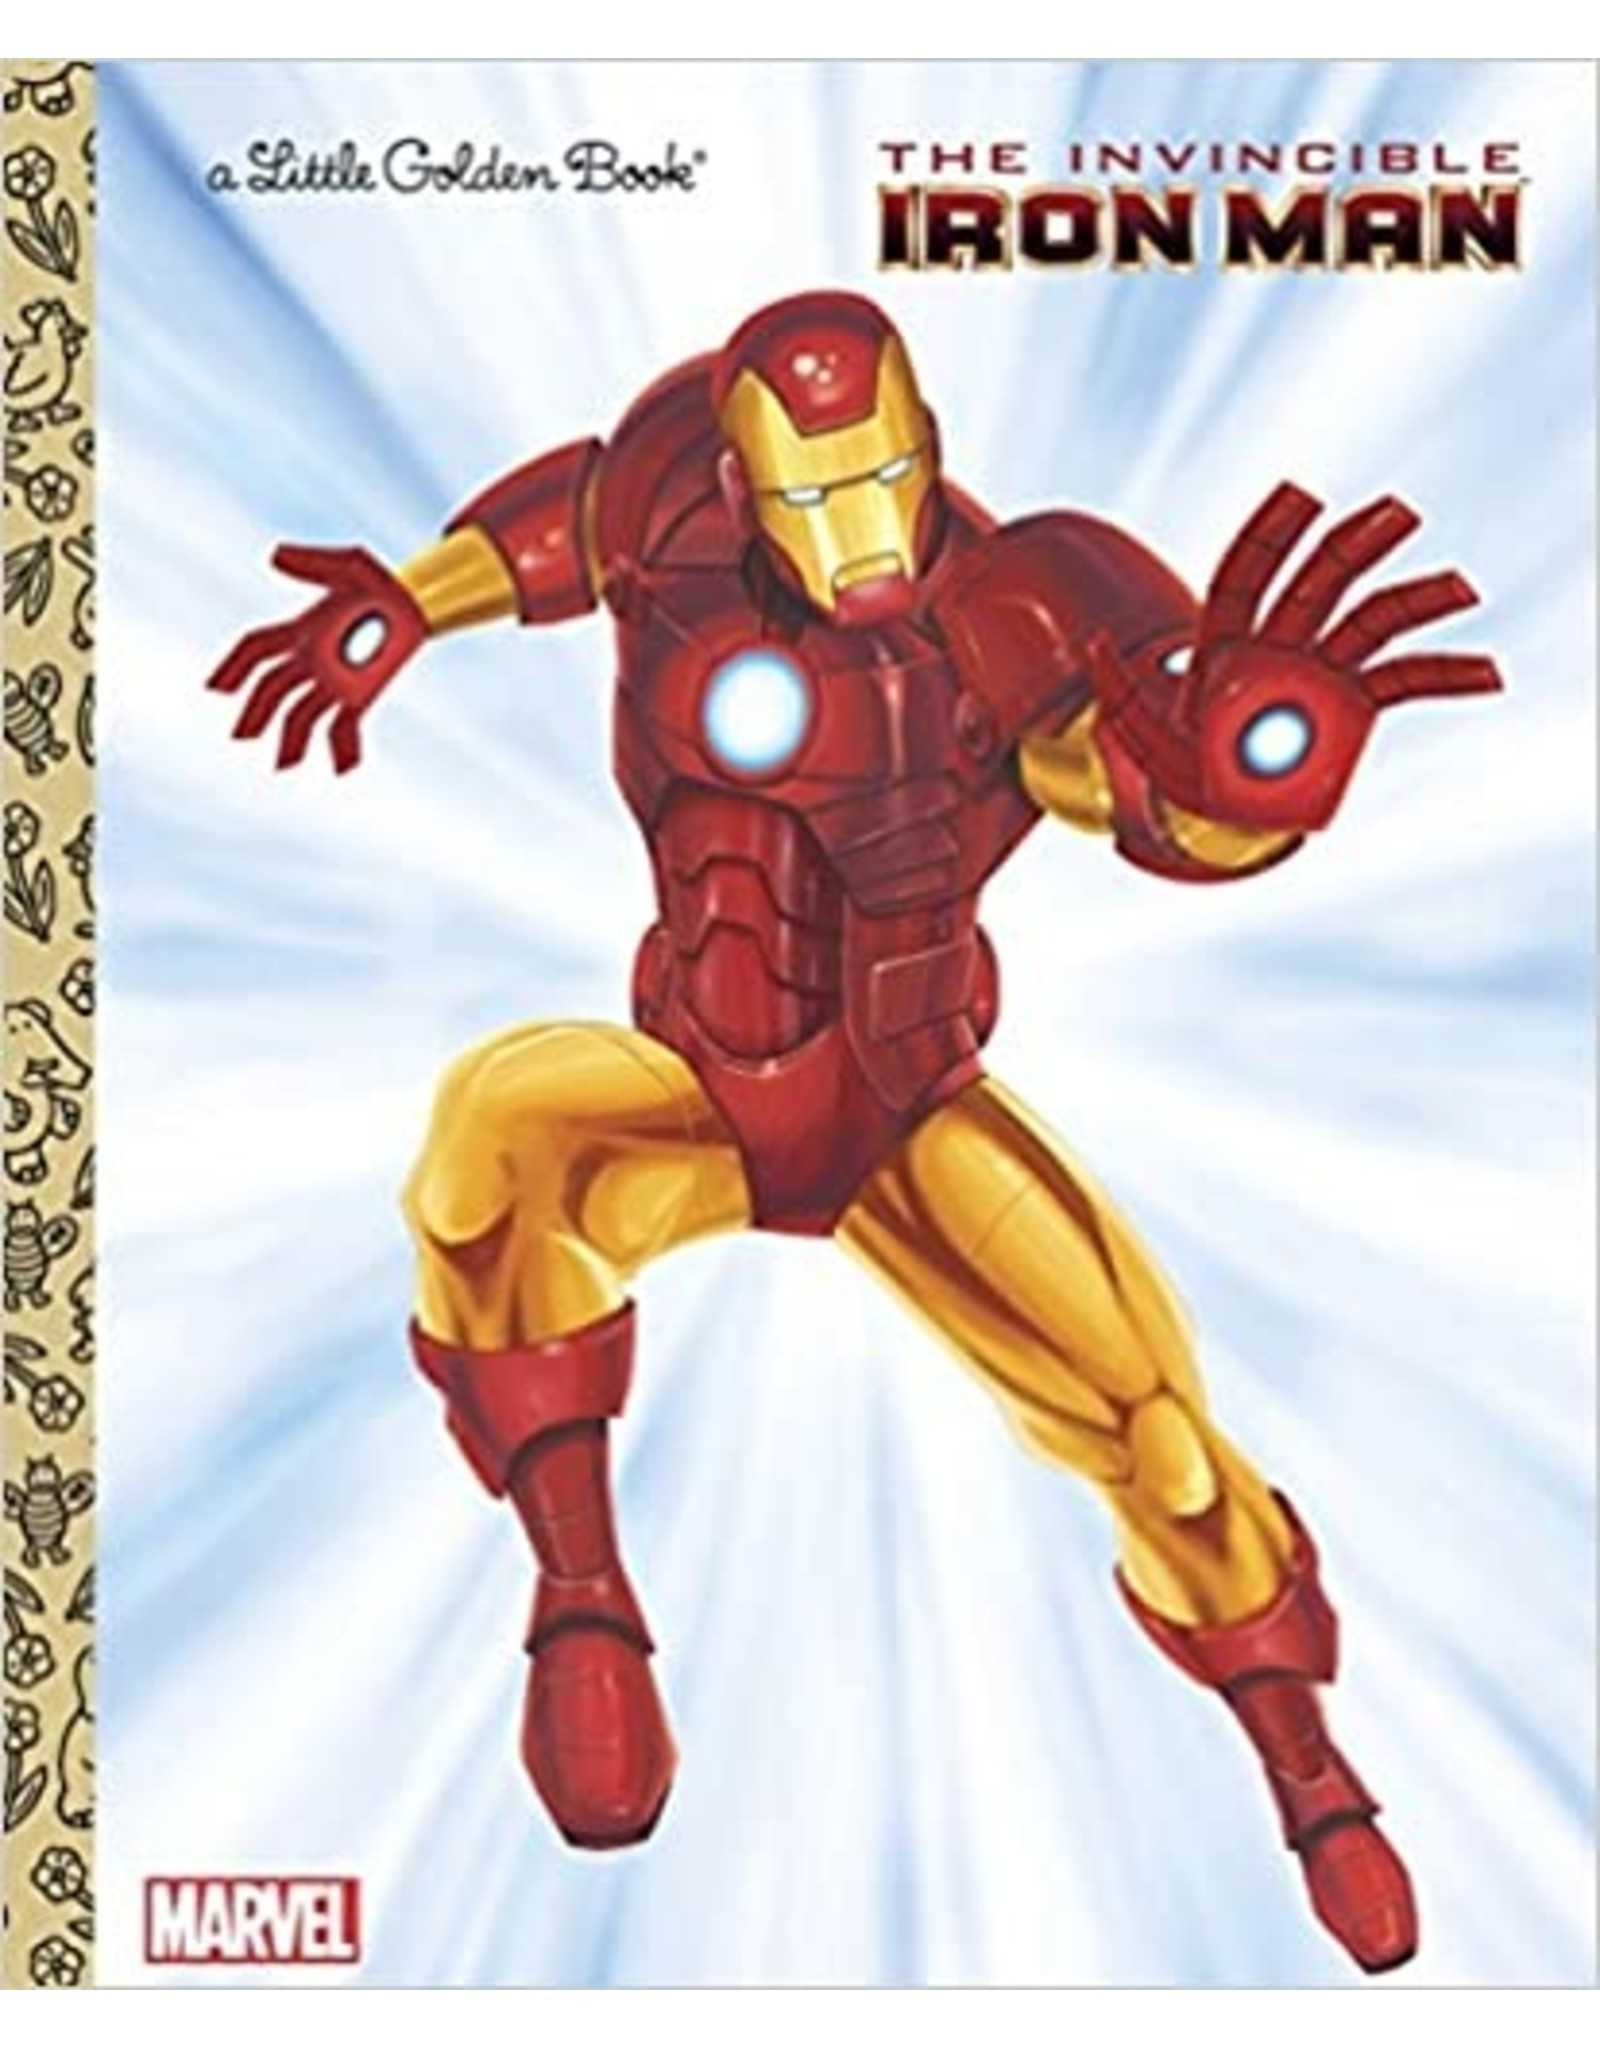 THE INVINCIBLE IRON MAN (MARVEL) LITTLE GOLDEN BOOK